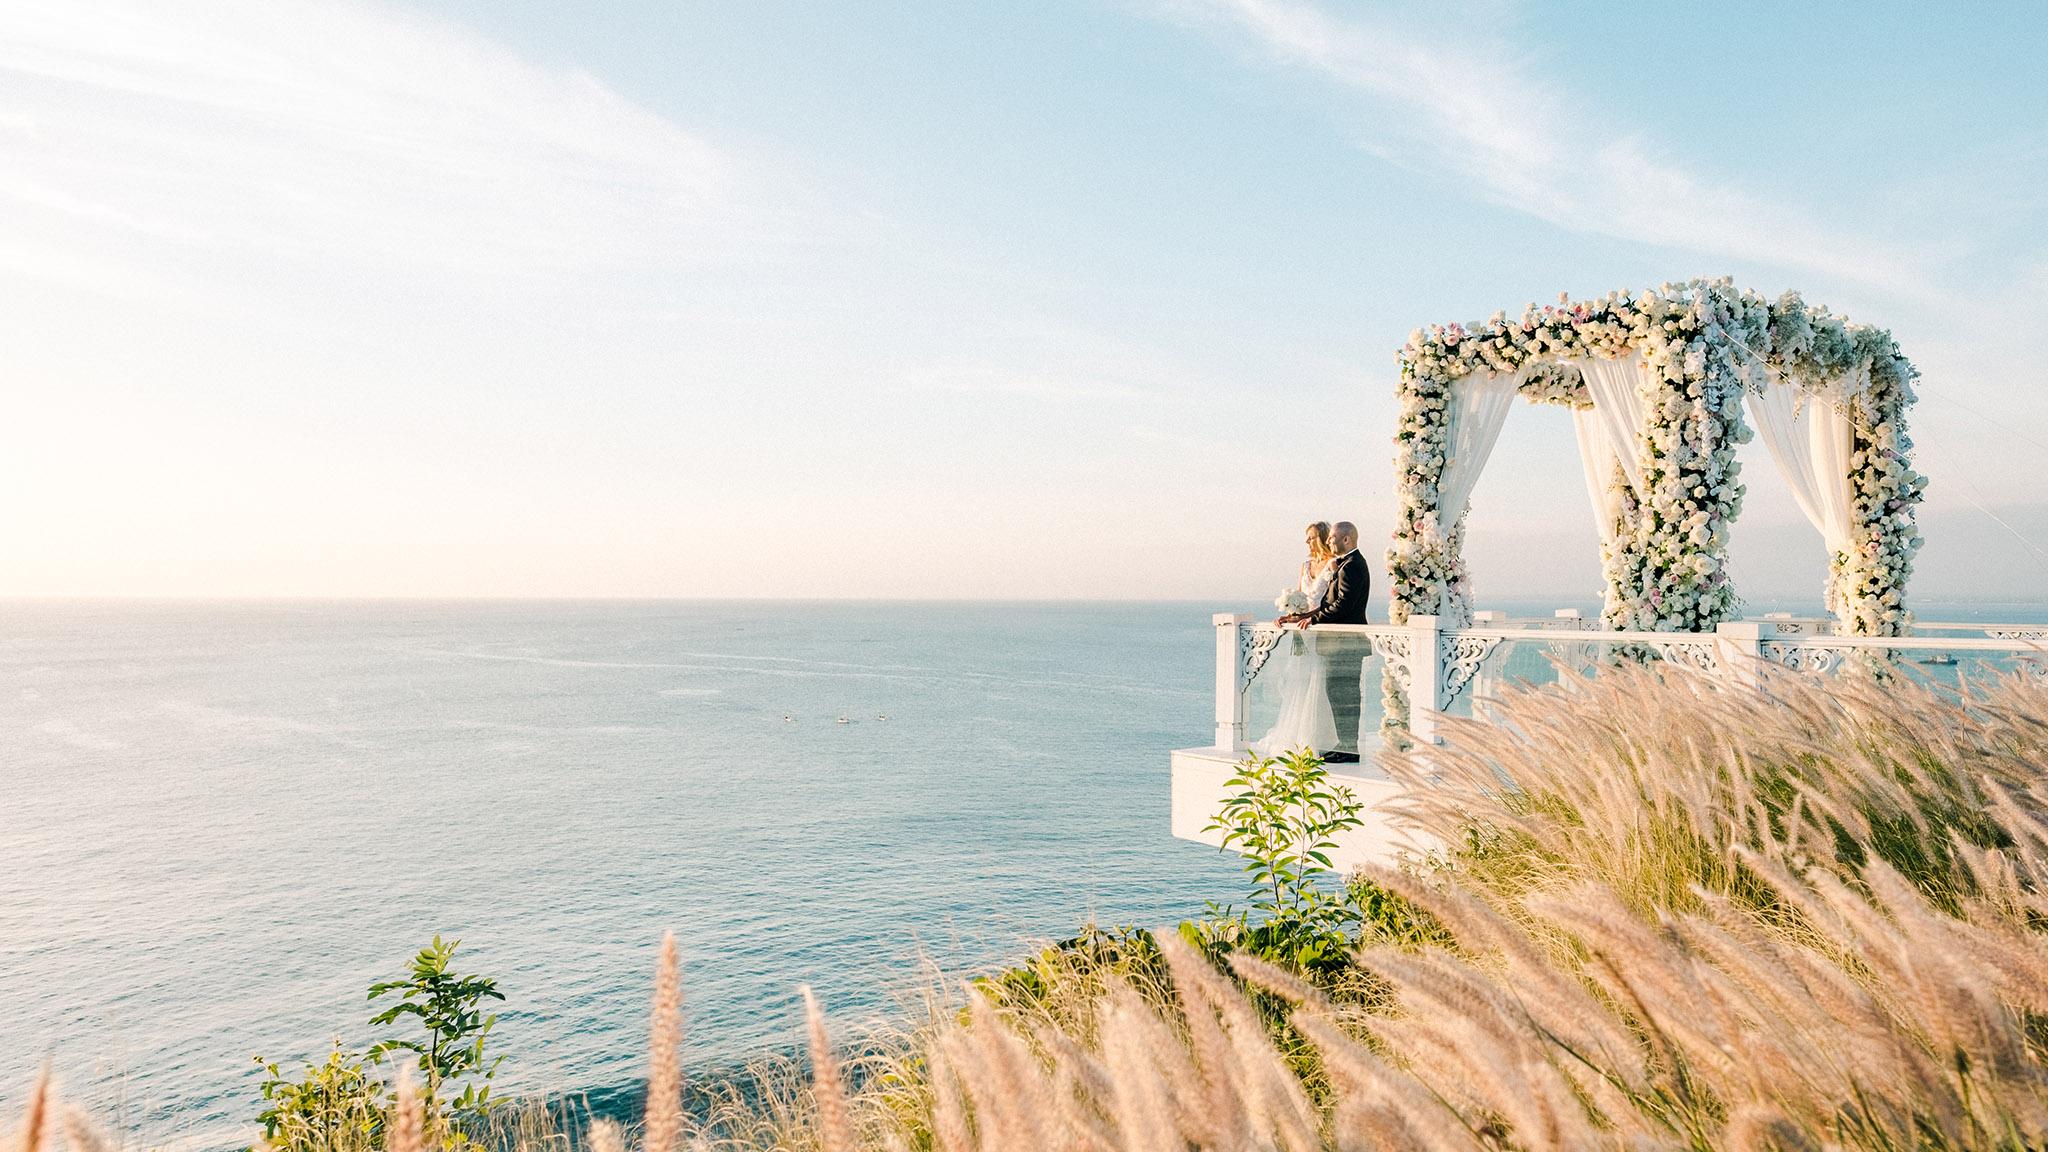 Bali Wedding Venue 7 Breathtaking Clifftop Venues: Wedding Venues By The Water At Reisefeber.org